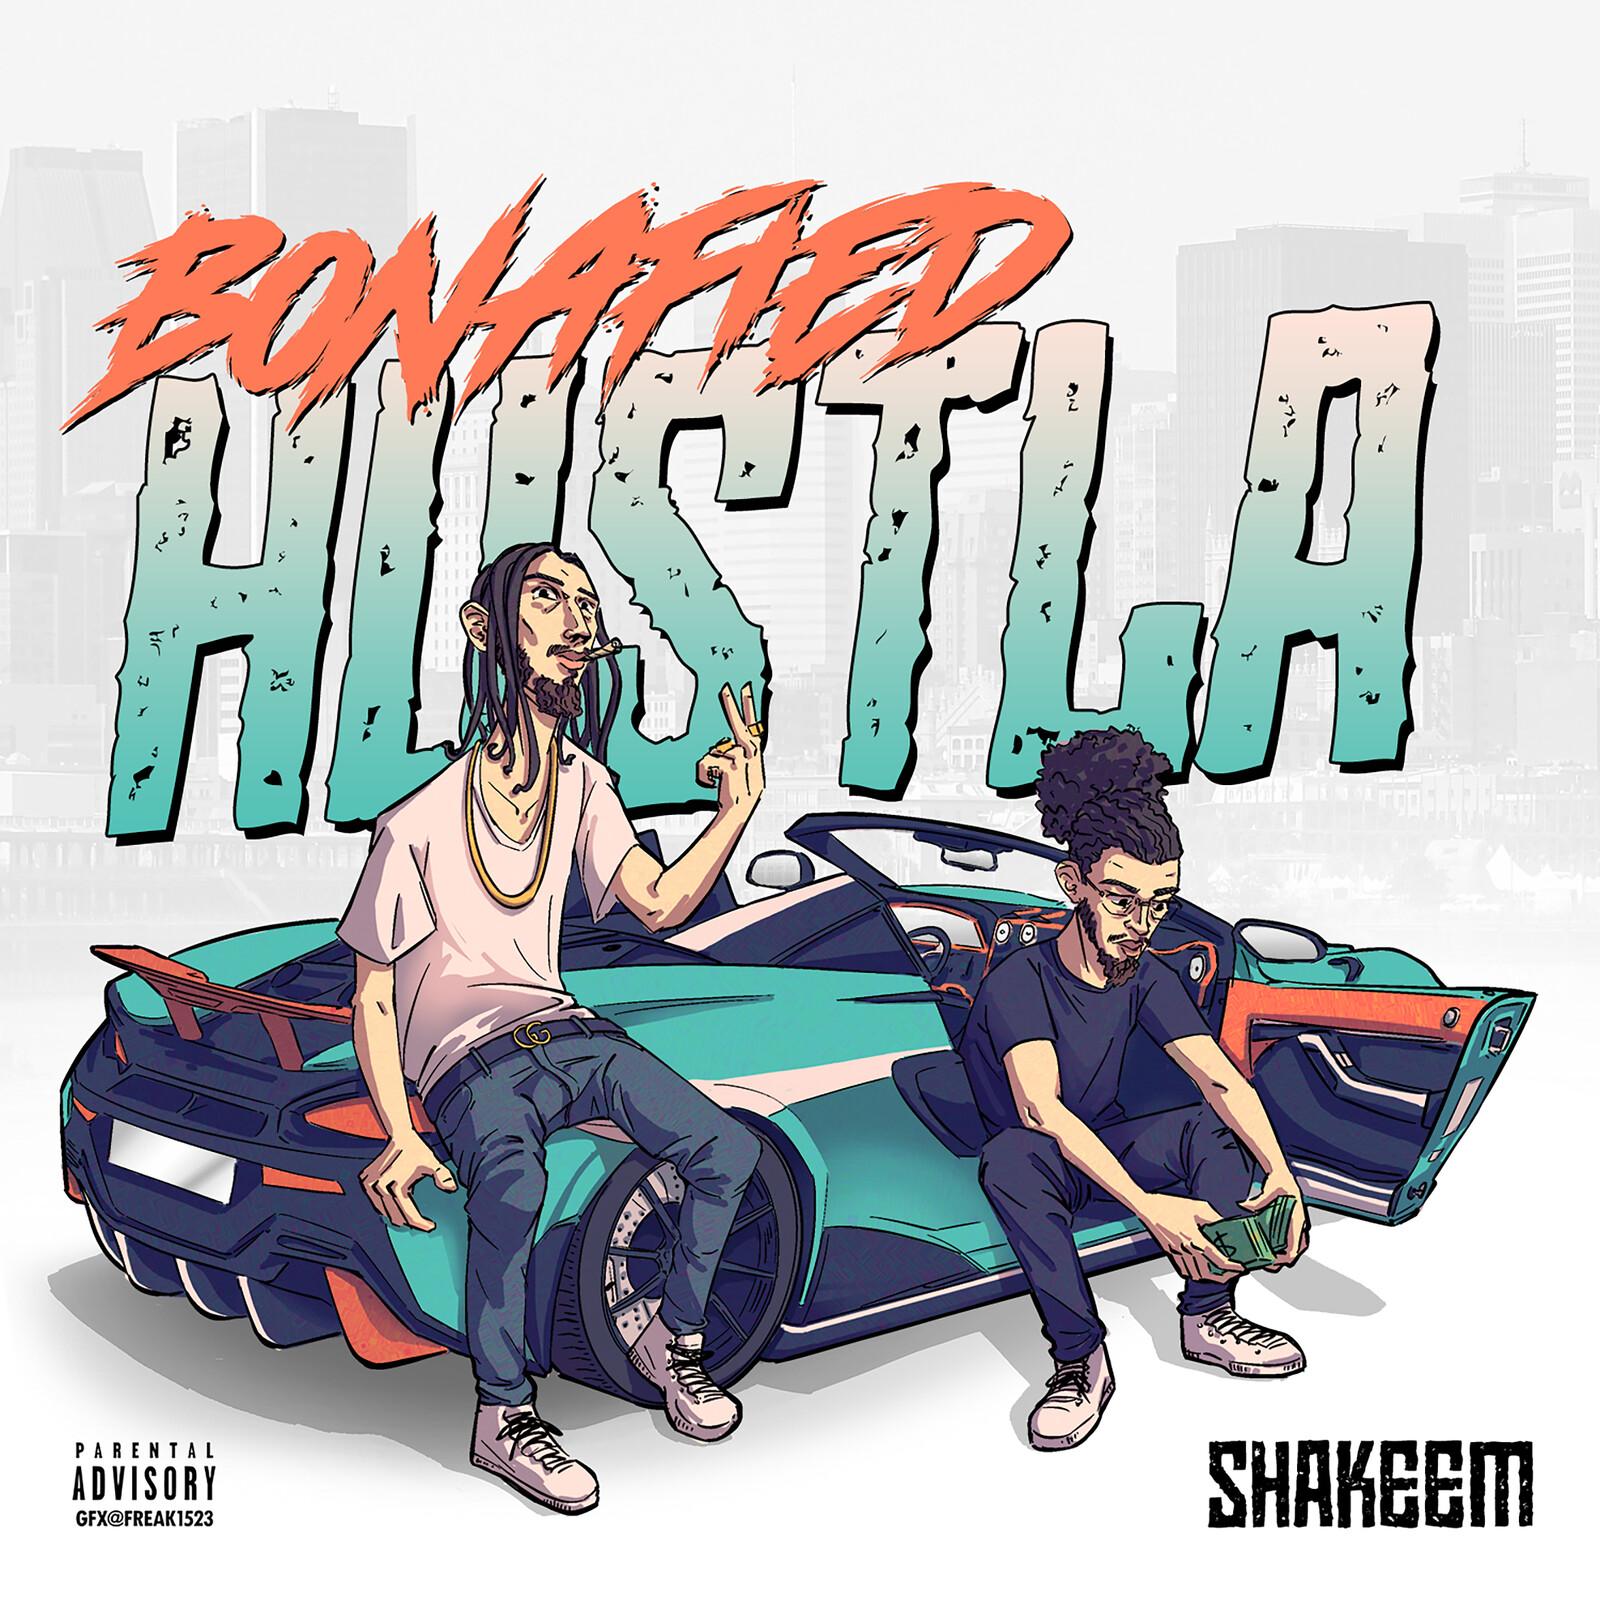 Album Cover collaboration - BONAFIELD HUSTLA by SHAKEEM